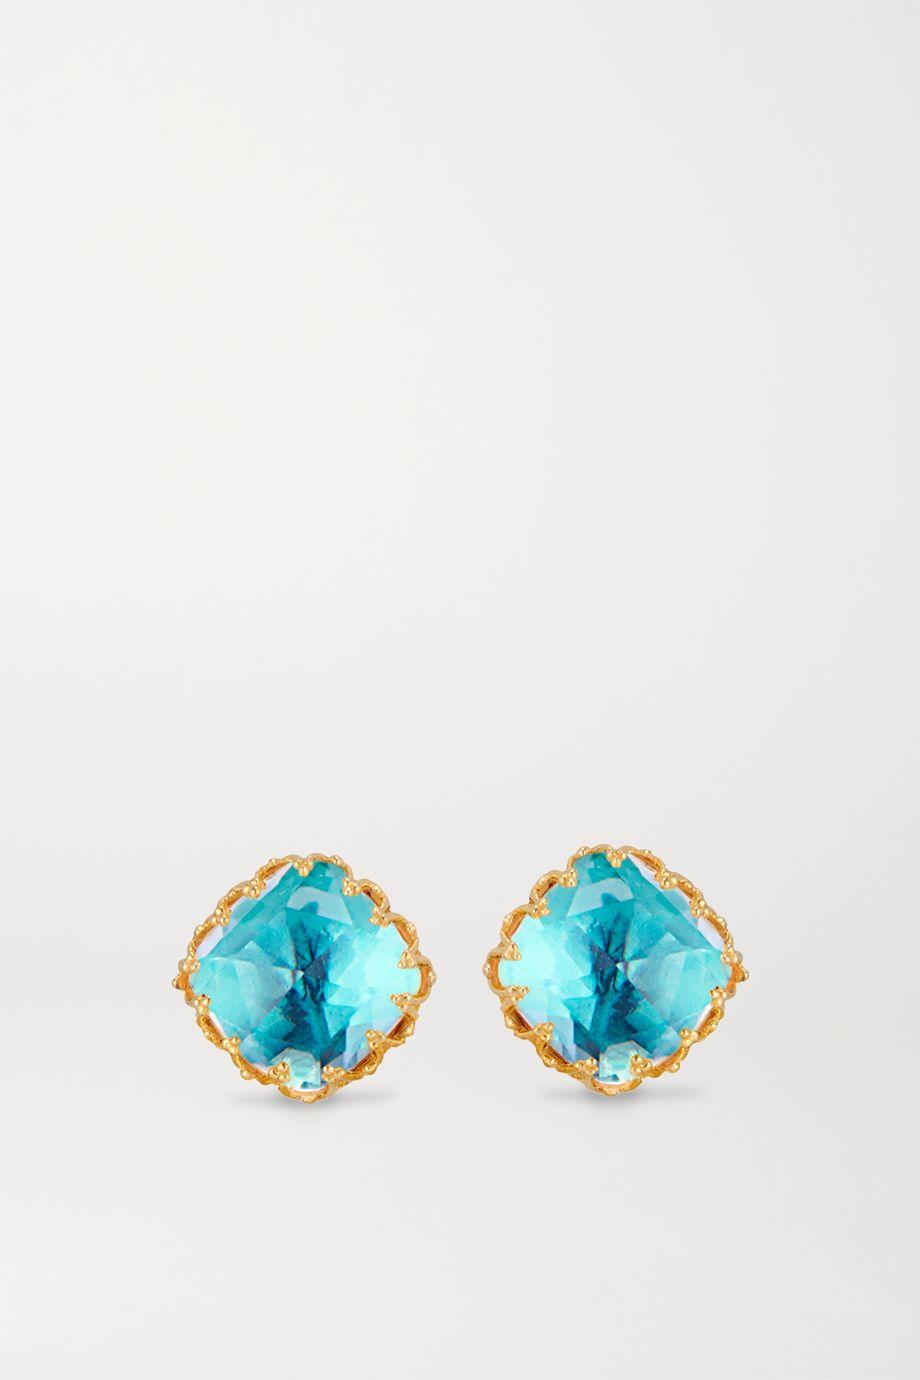 Larkspur & Hawk Jane small 18-karat gold-dipped quartz earrings